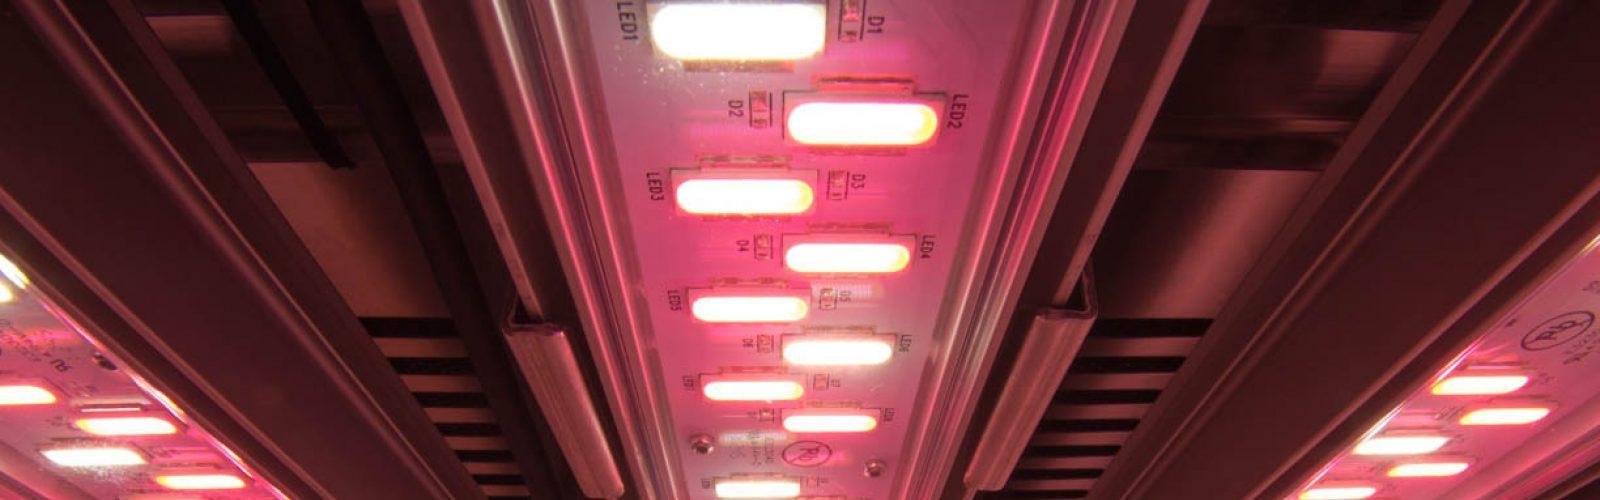 plant-growth-chamber-valoya-LED